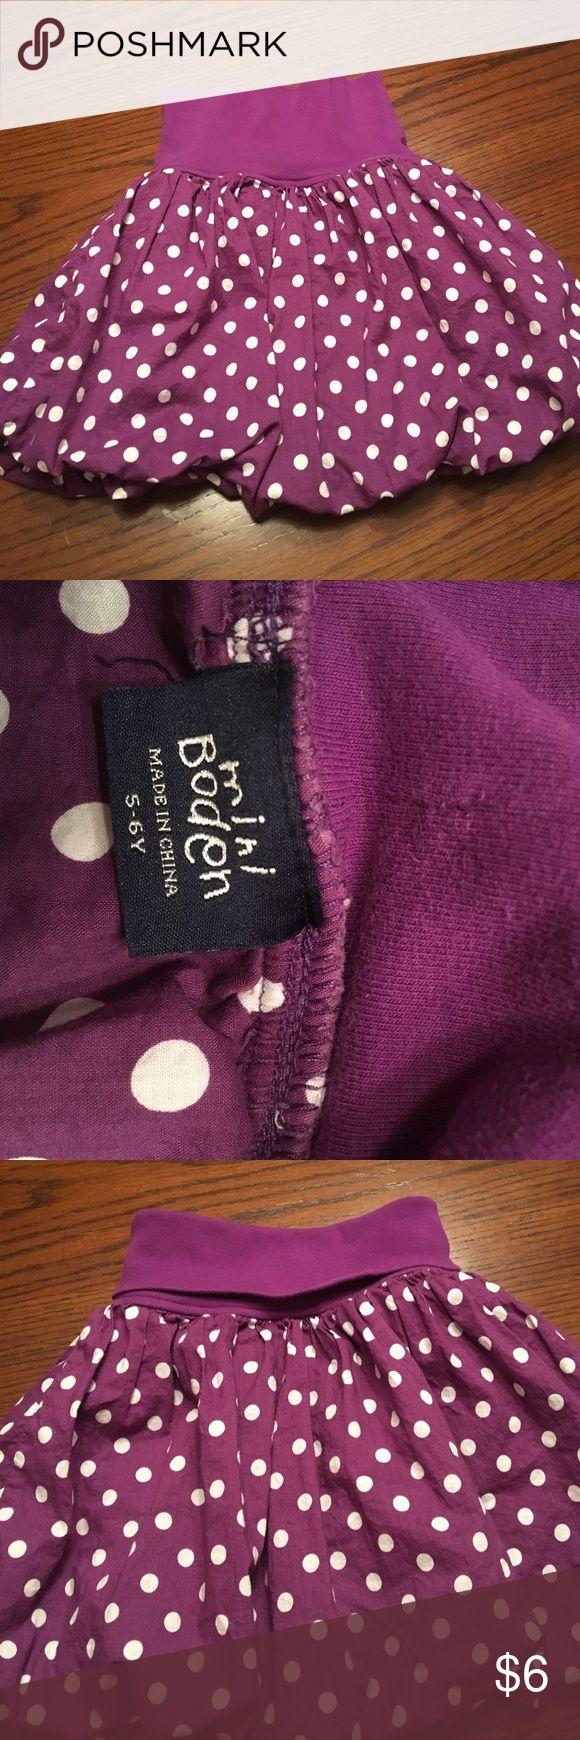 Mini Boden skirt Mini Boden puff skirt, cotton knit waist band, can fold down or leave up.  Cotton purple/white polka dots, cute! Mini Boden Bottoms Skirts